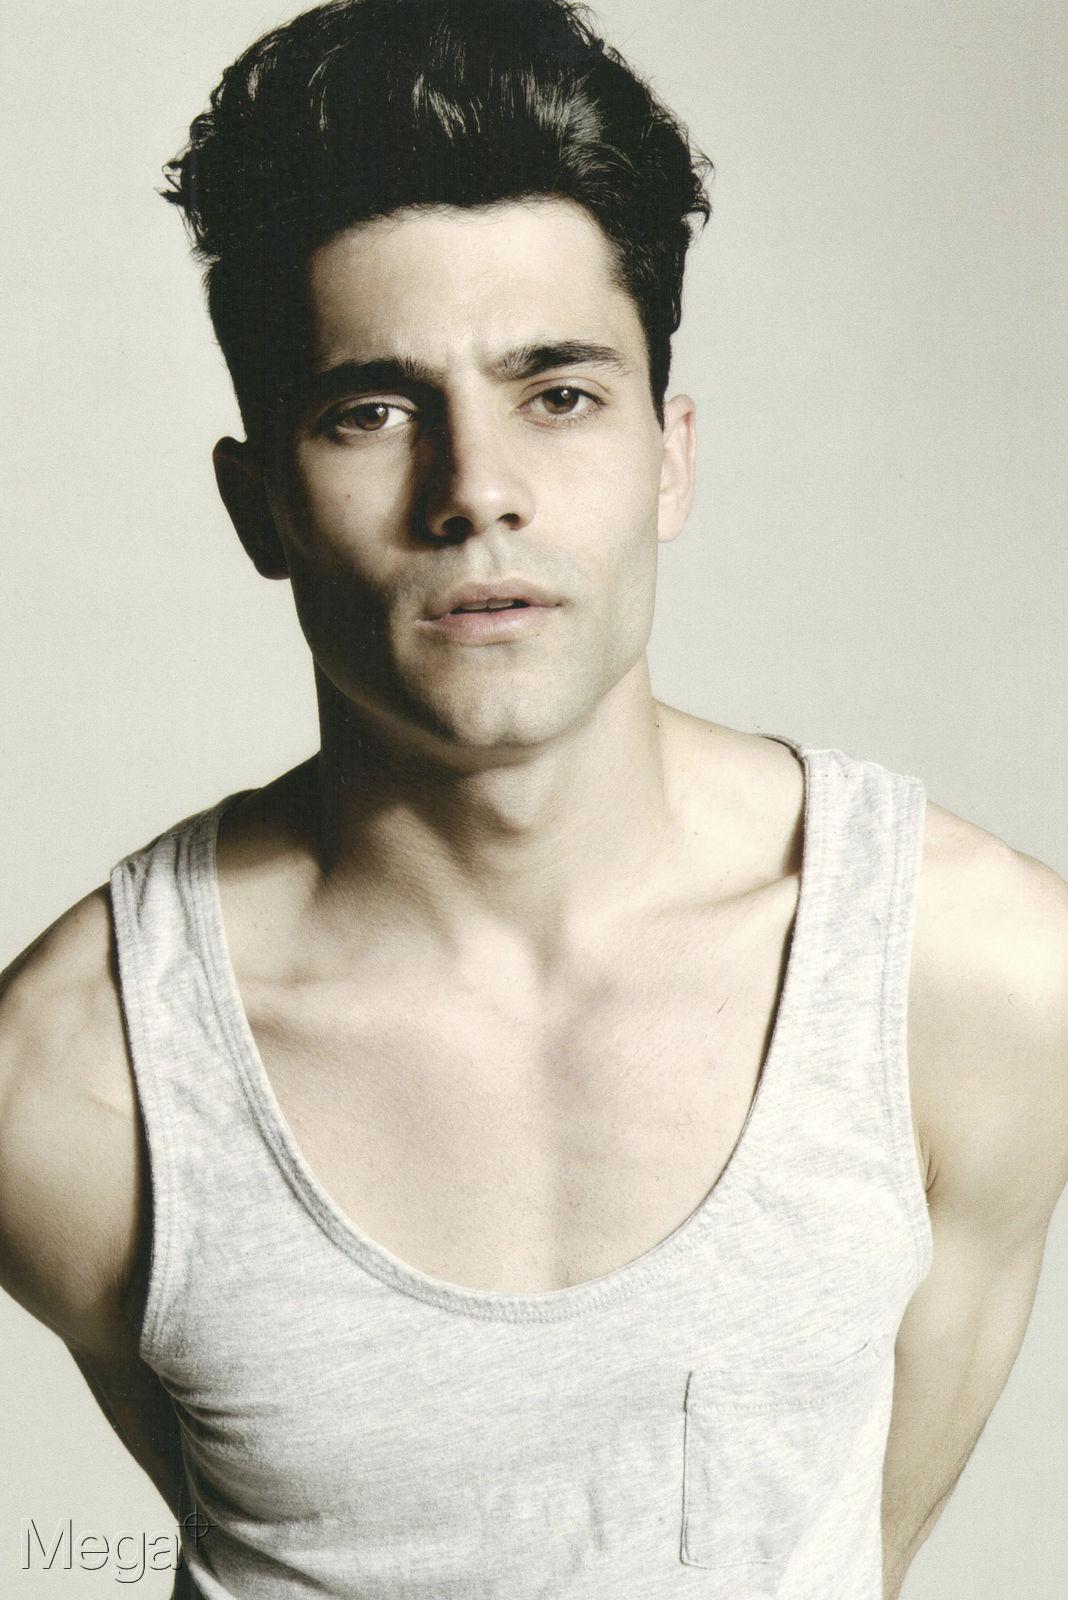 Marco Llorente Mega Model Agency